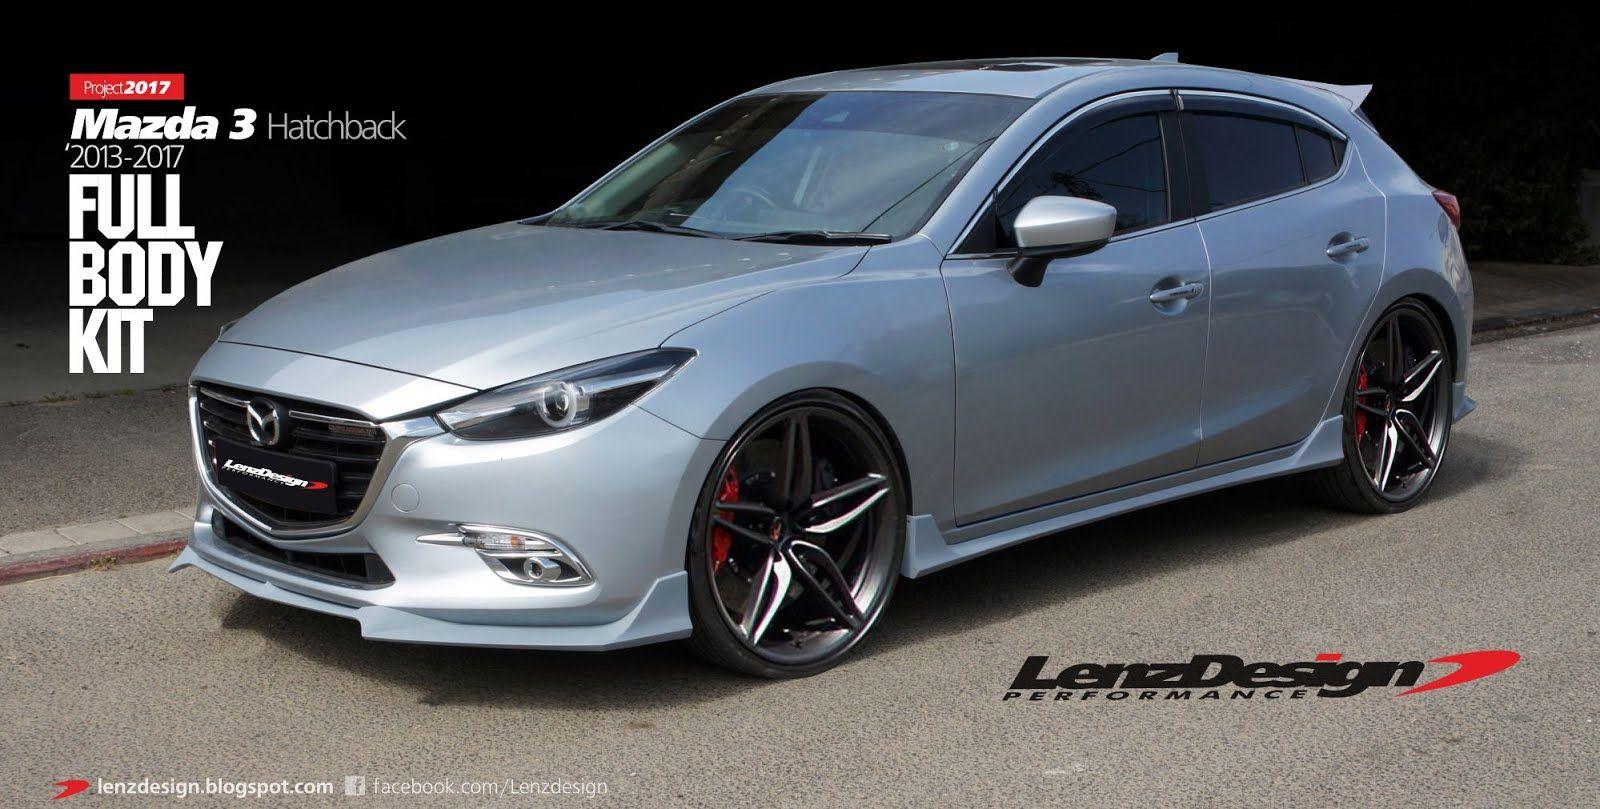 Mazda 3 Bm 2017 Body Kit Hatchback Sedan Rides Mazda Mazda